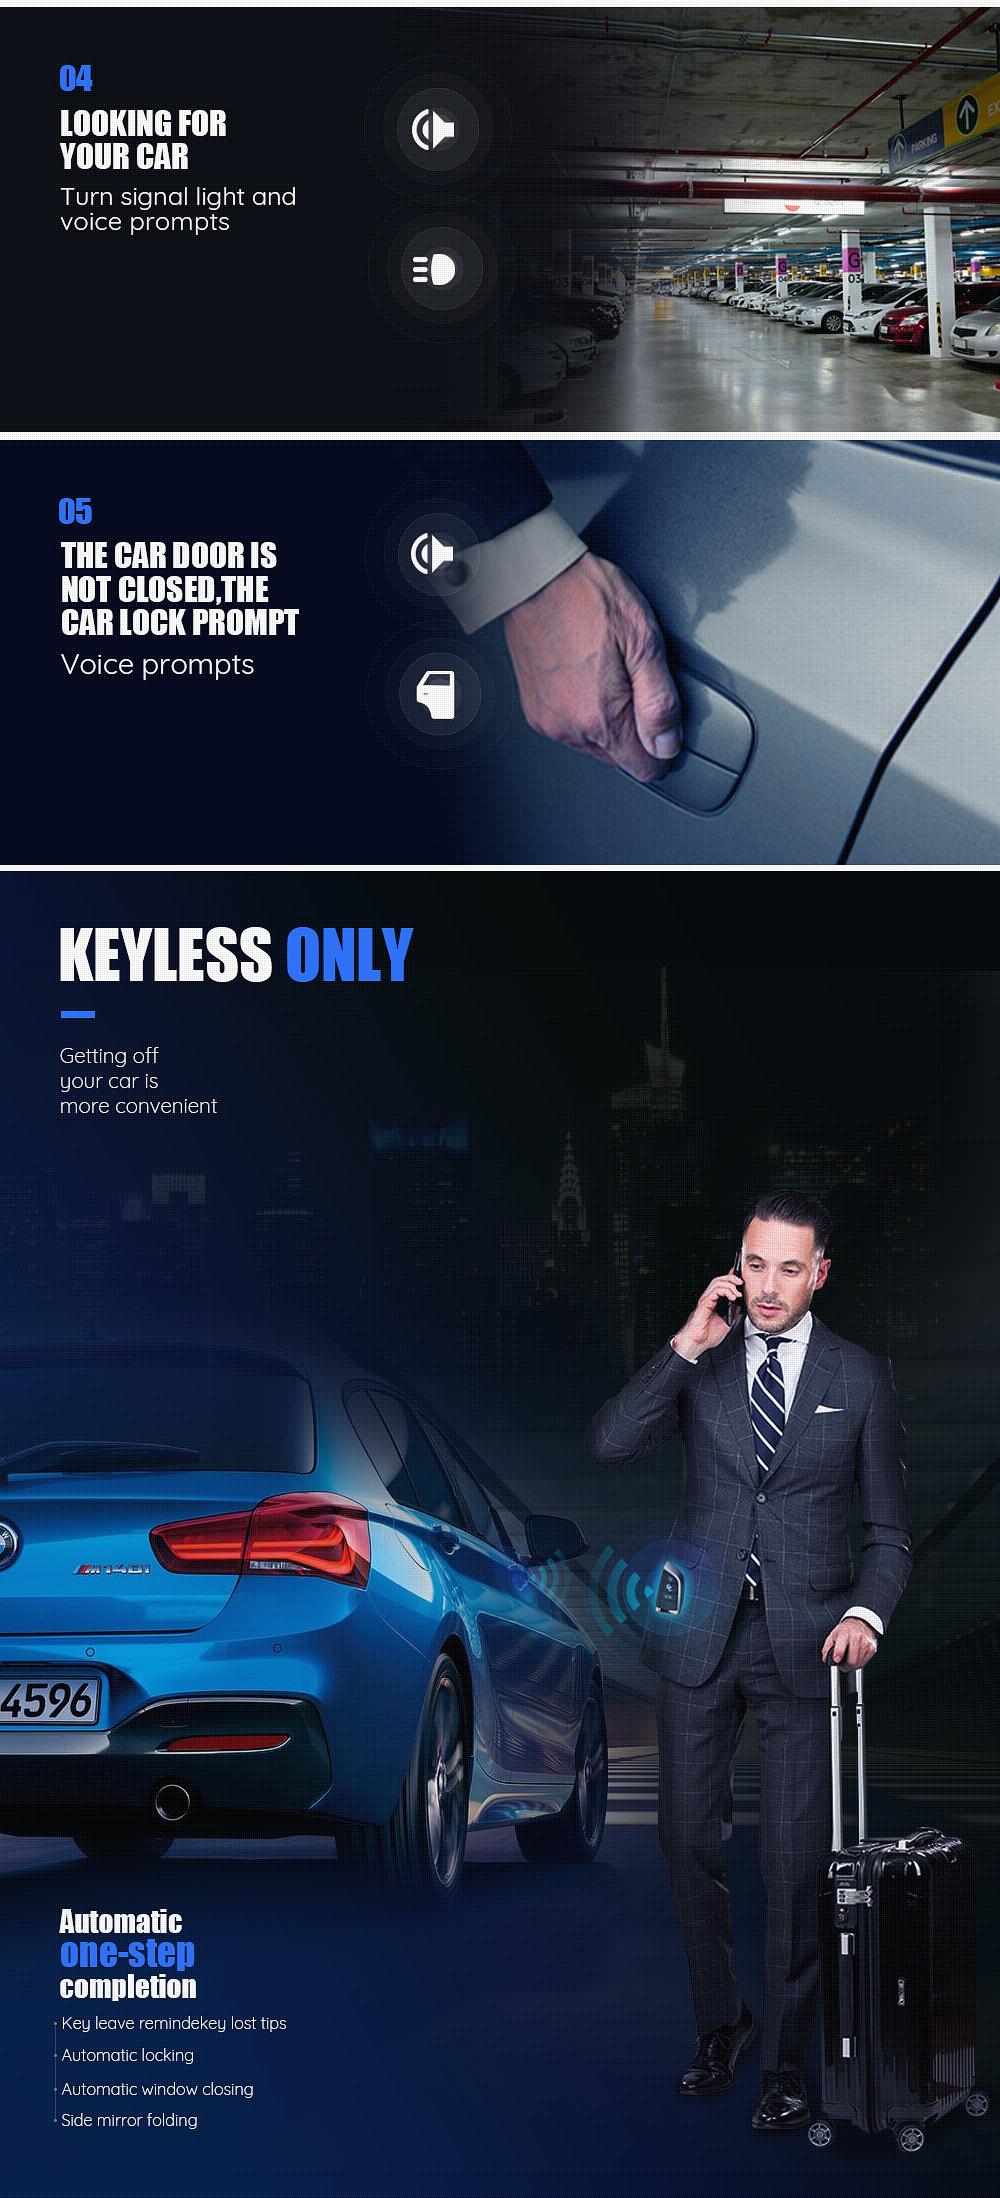 Car Keyless Entry For Mercedes-benz Glc Class Glc 300 260 200 300 260  4matic Keyless Entry Scanner Universal Remote Control - Buy Car Keyless